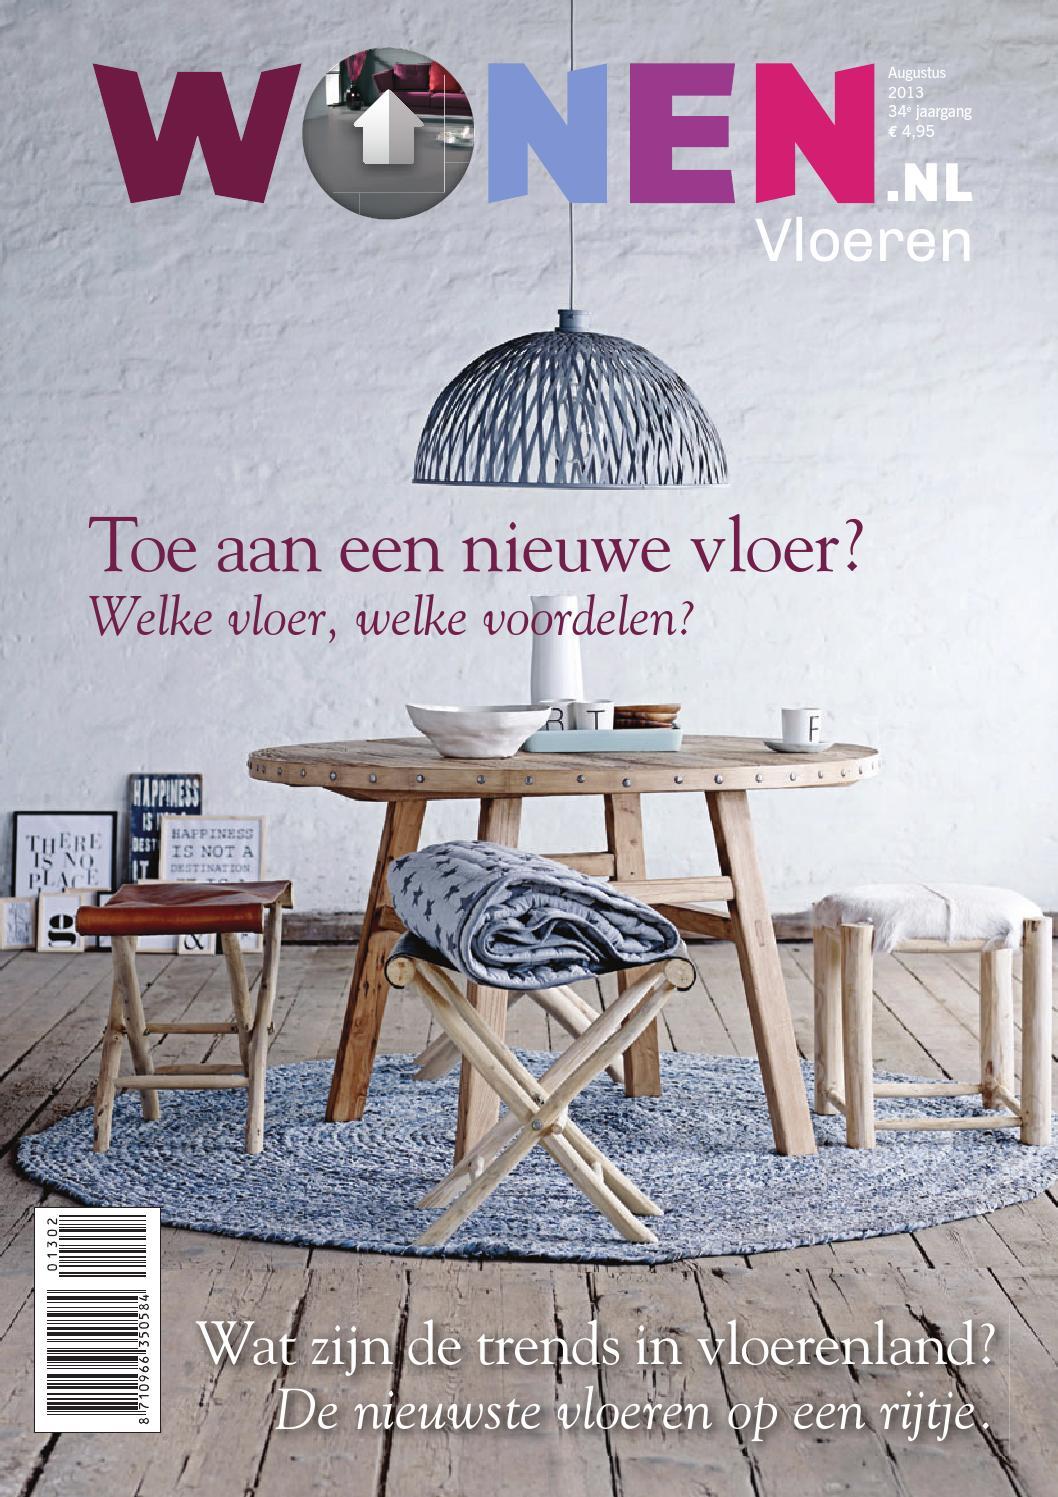 Wonen.nl Vloeren 2013 nr. 2 by Wonen Media - issuu